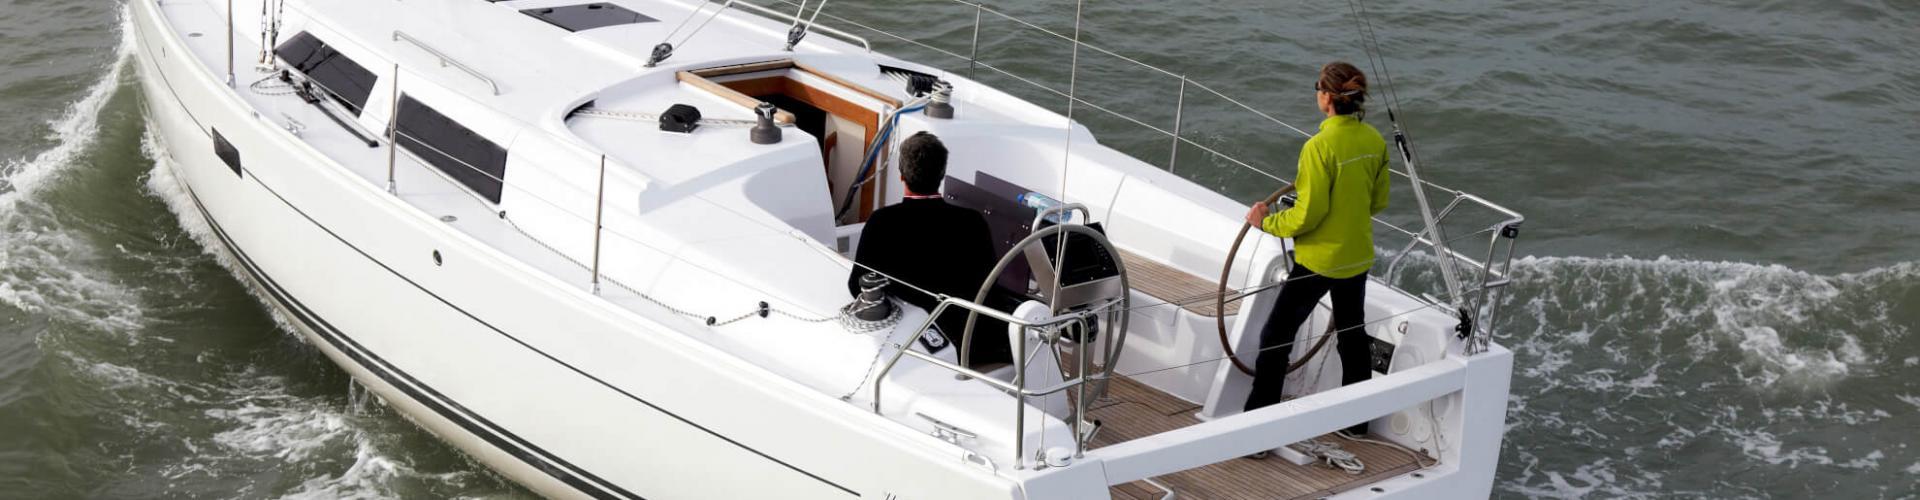 sailboat Hanse 375